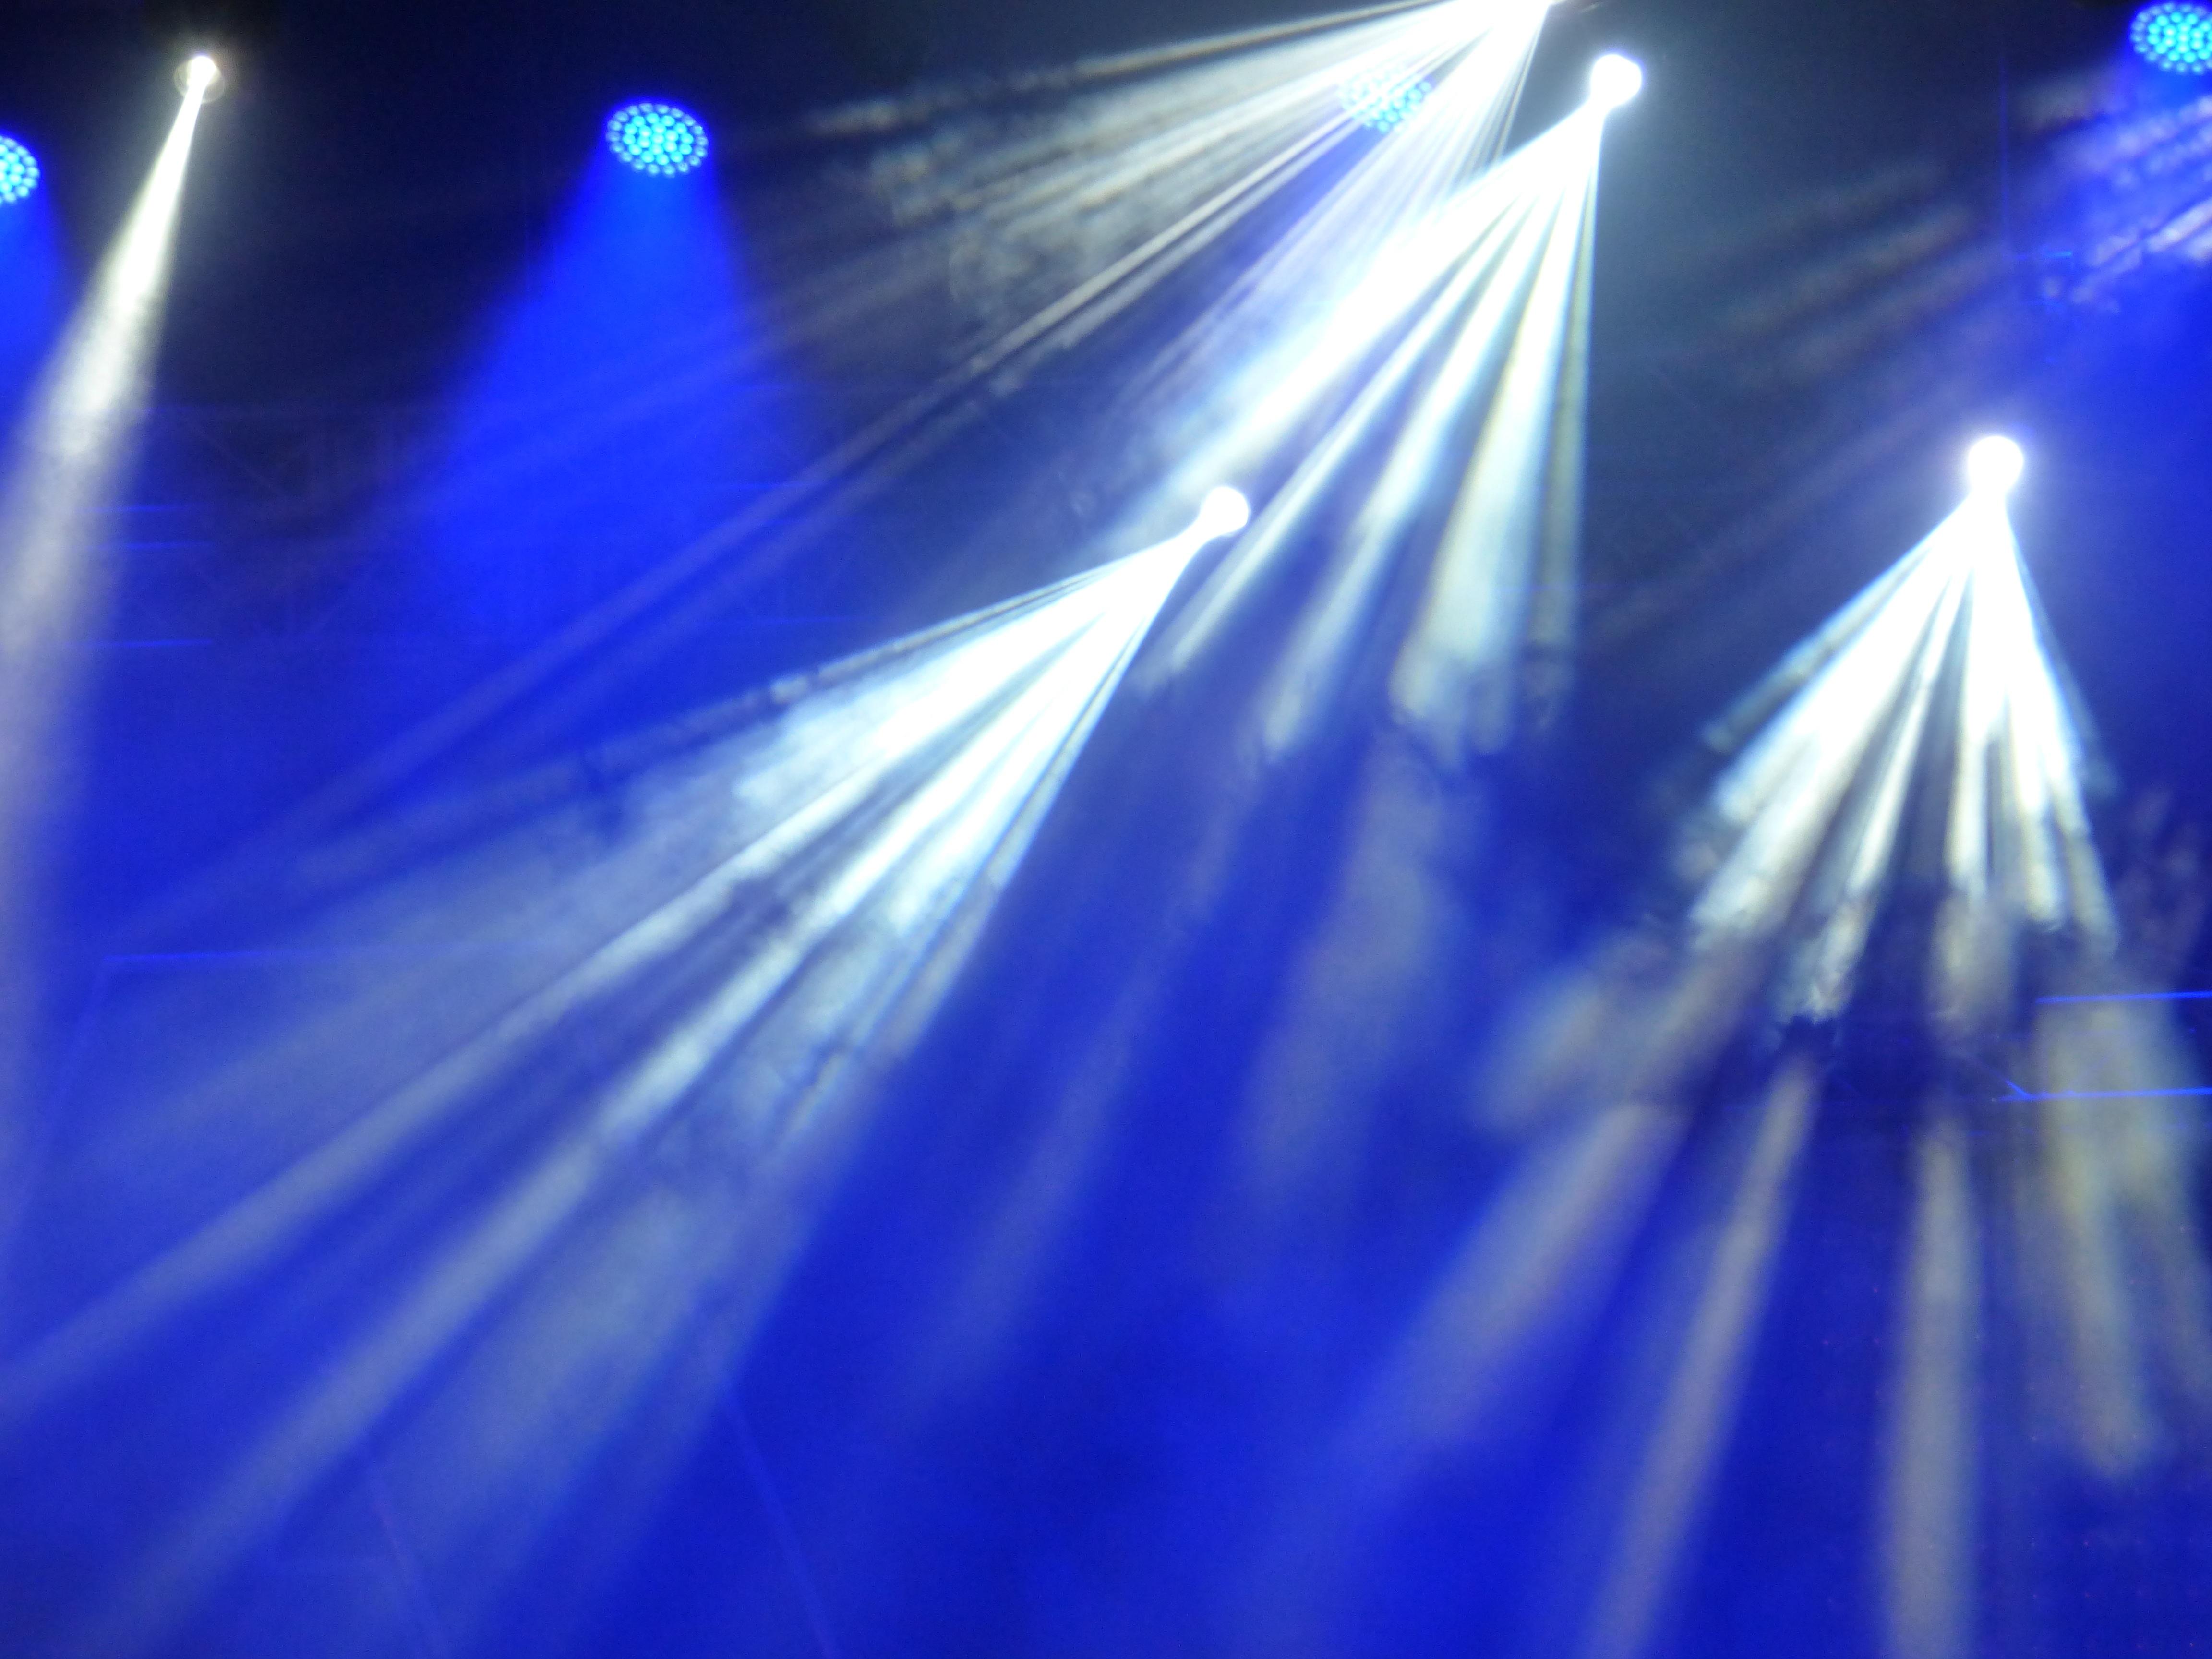 Light Sunlight Concert Reflection Blue Colorful Bulb Lighting Circle Lens Flare Stage Reflex Shape Disco